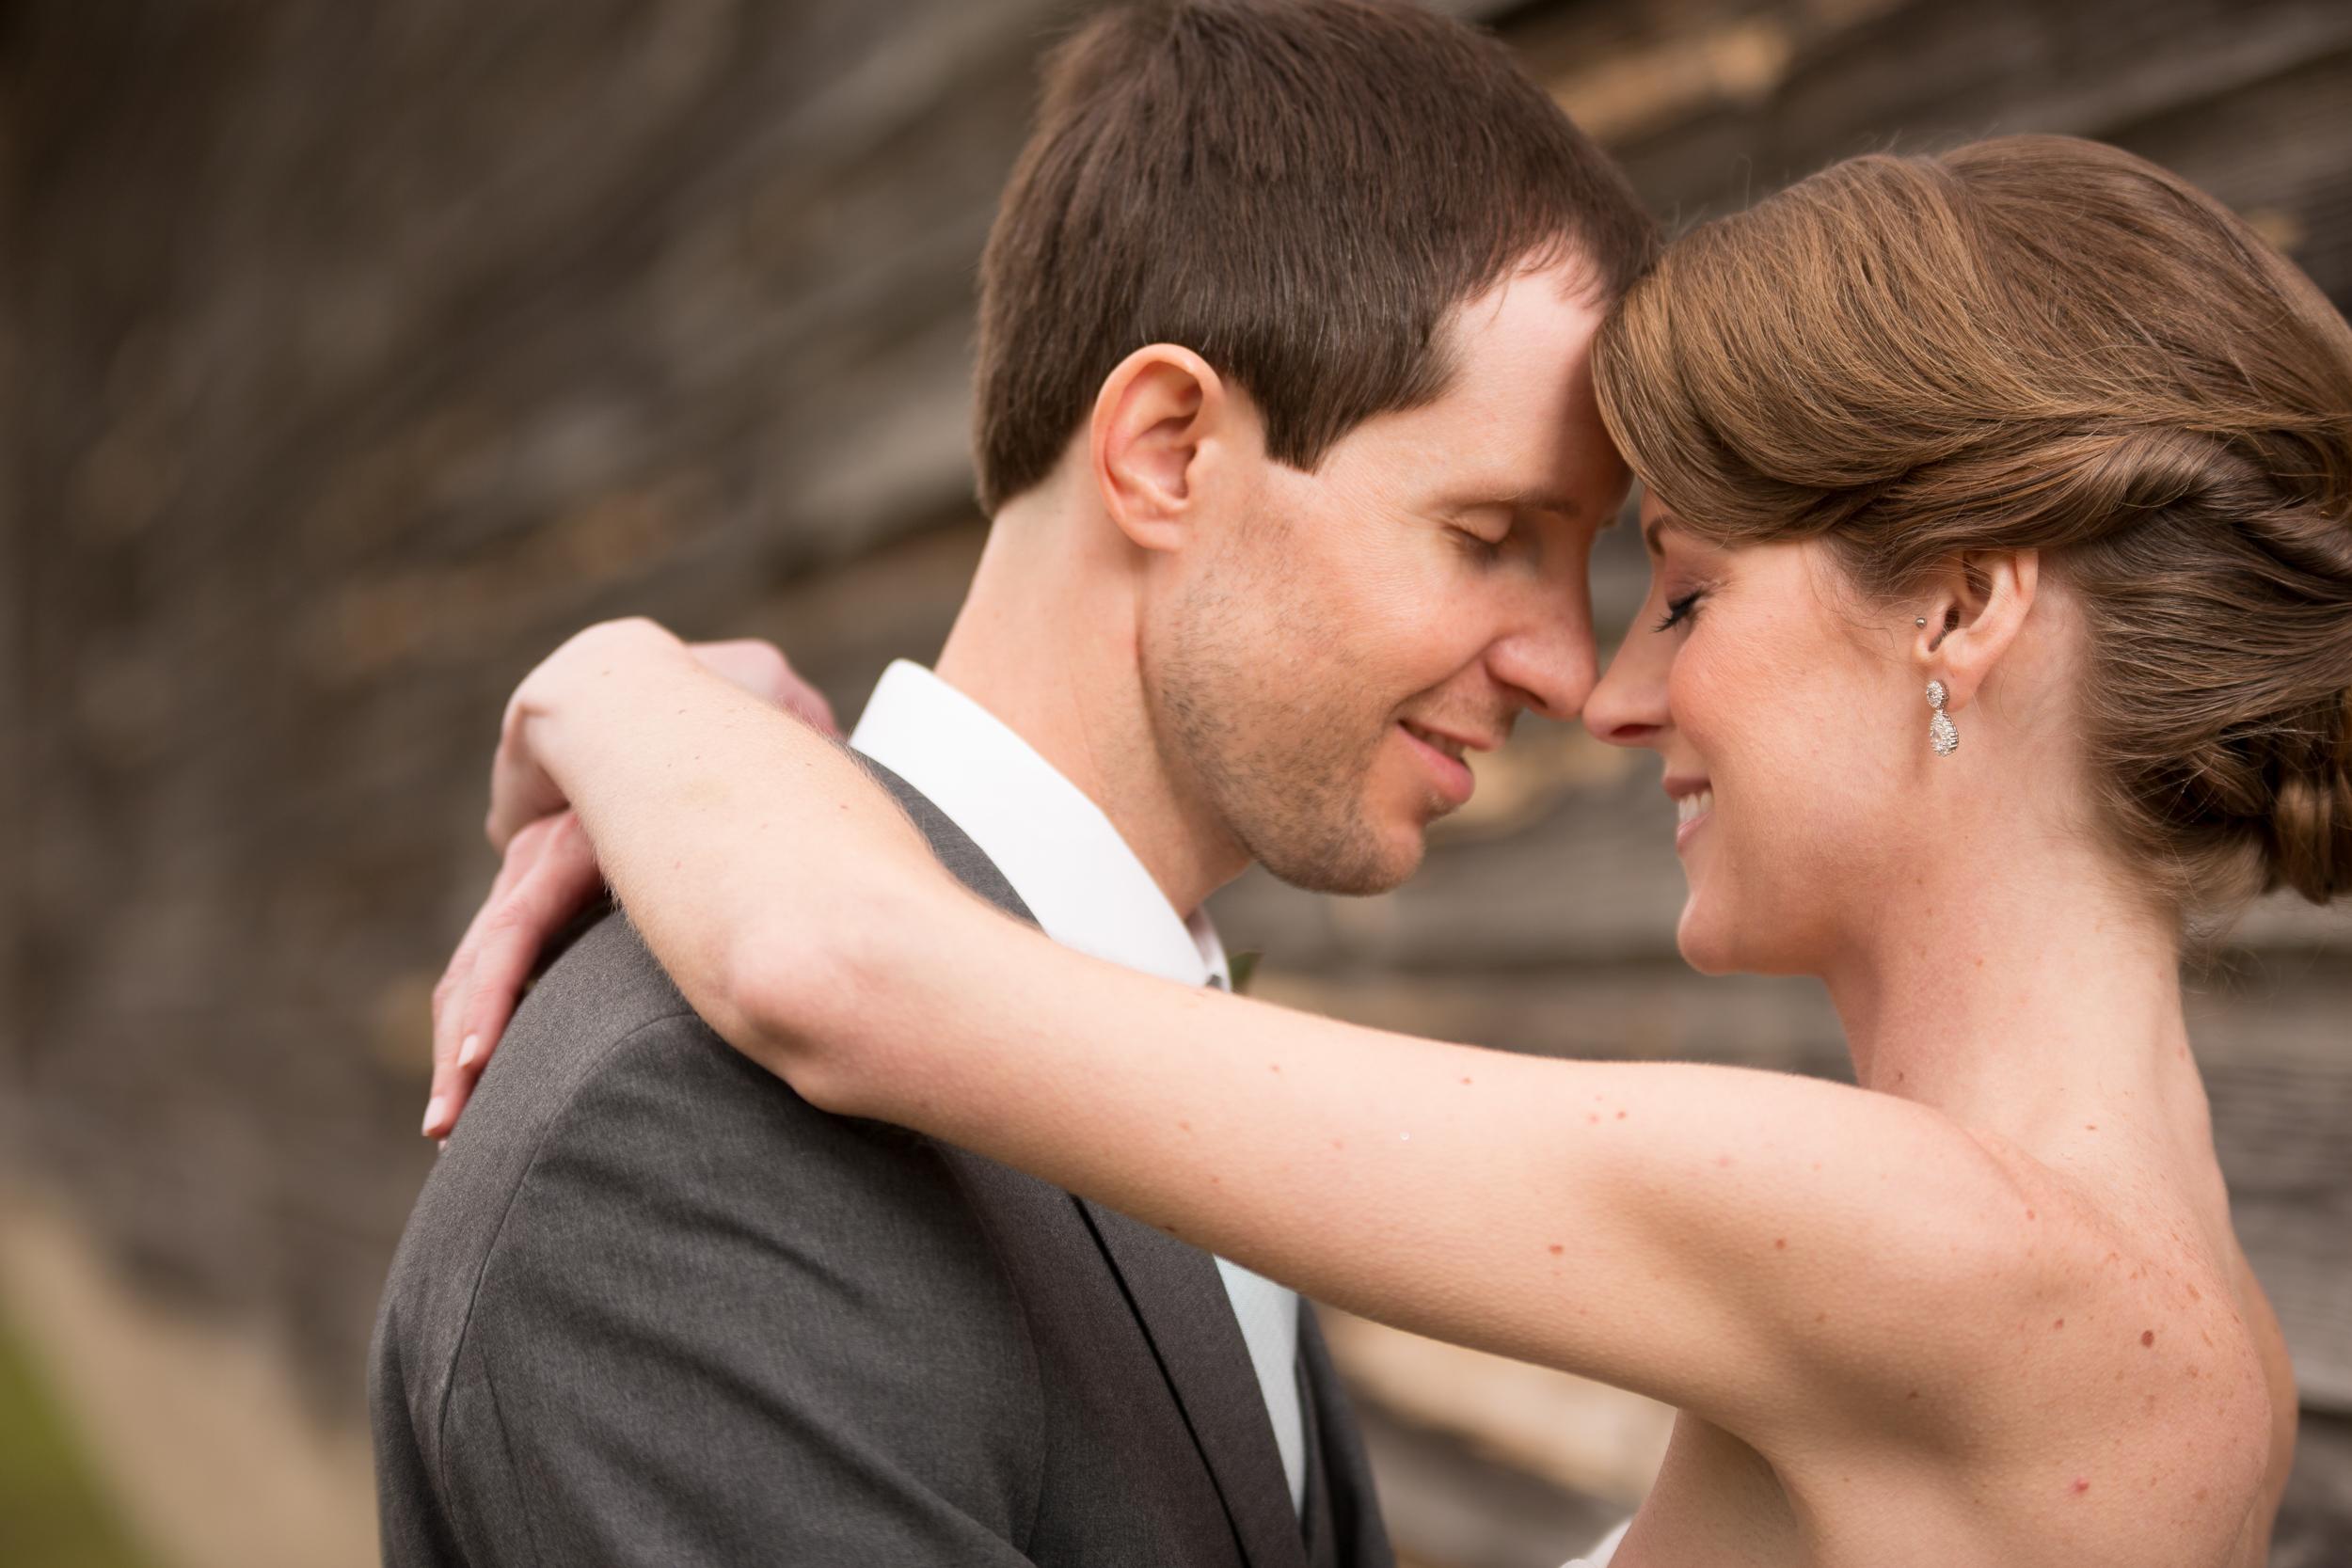 engagement-wedding-photographer-Dallas-Before-4.jpg